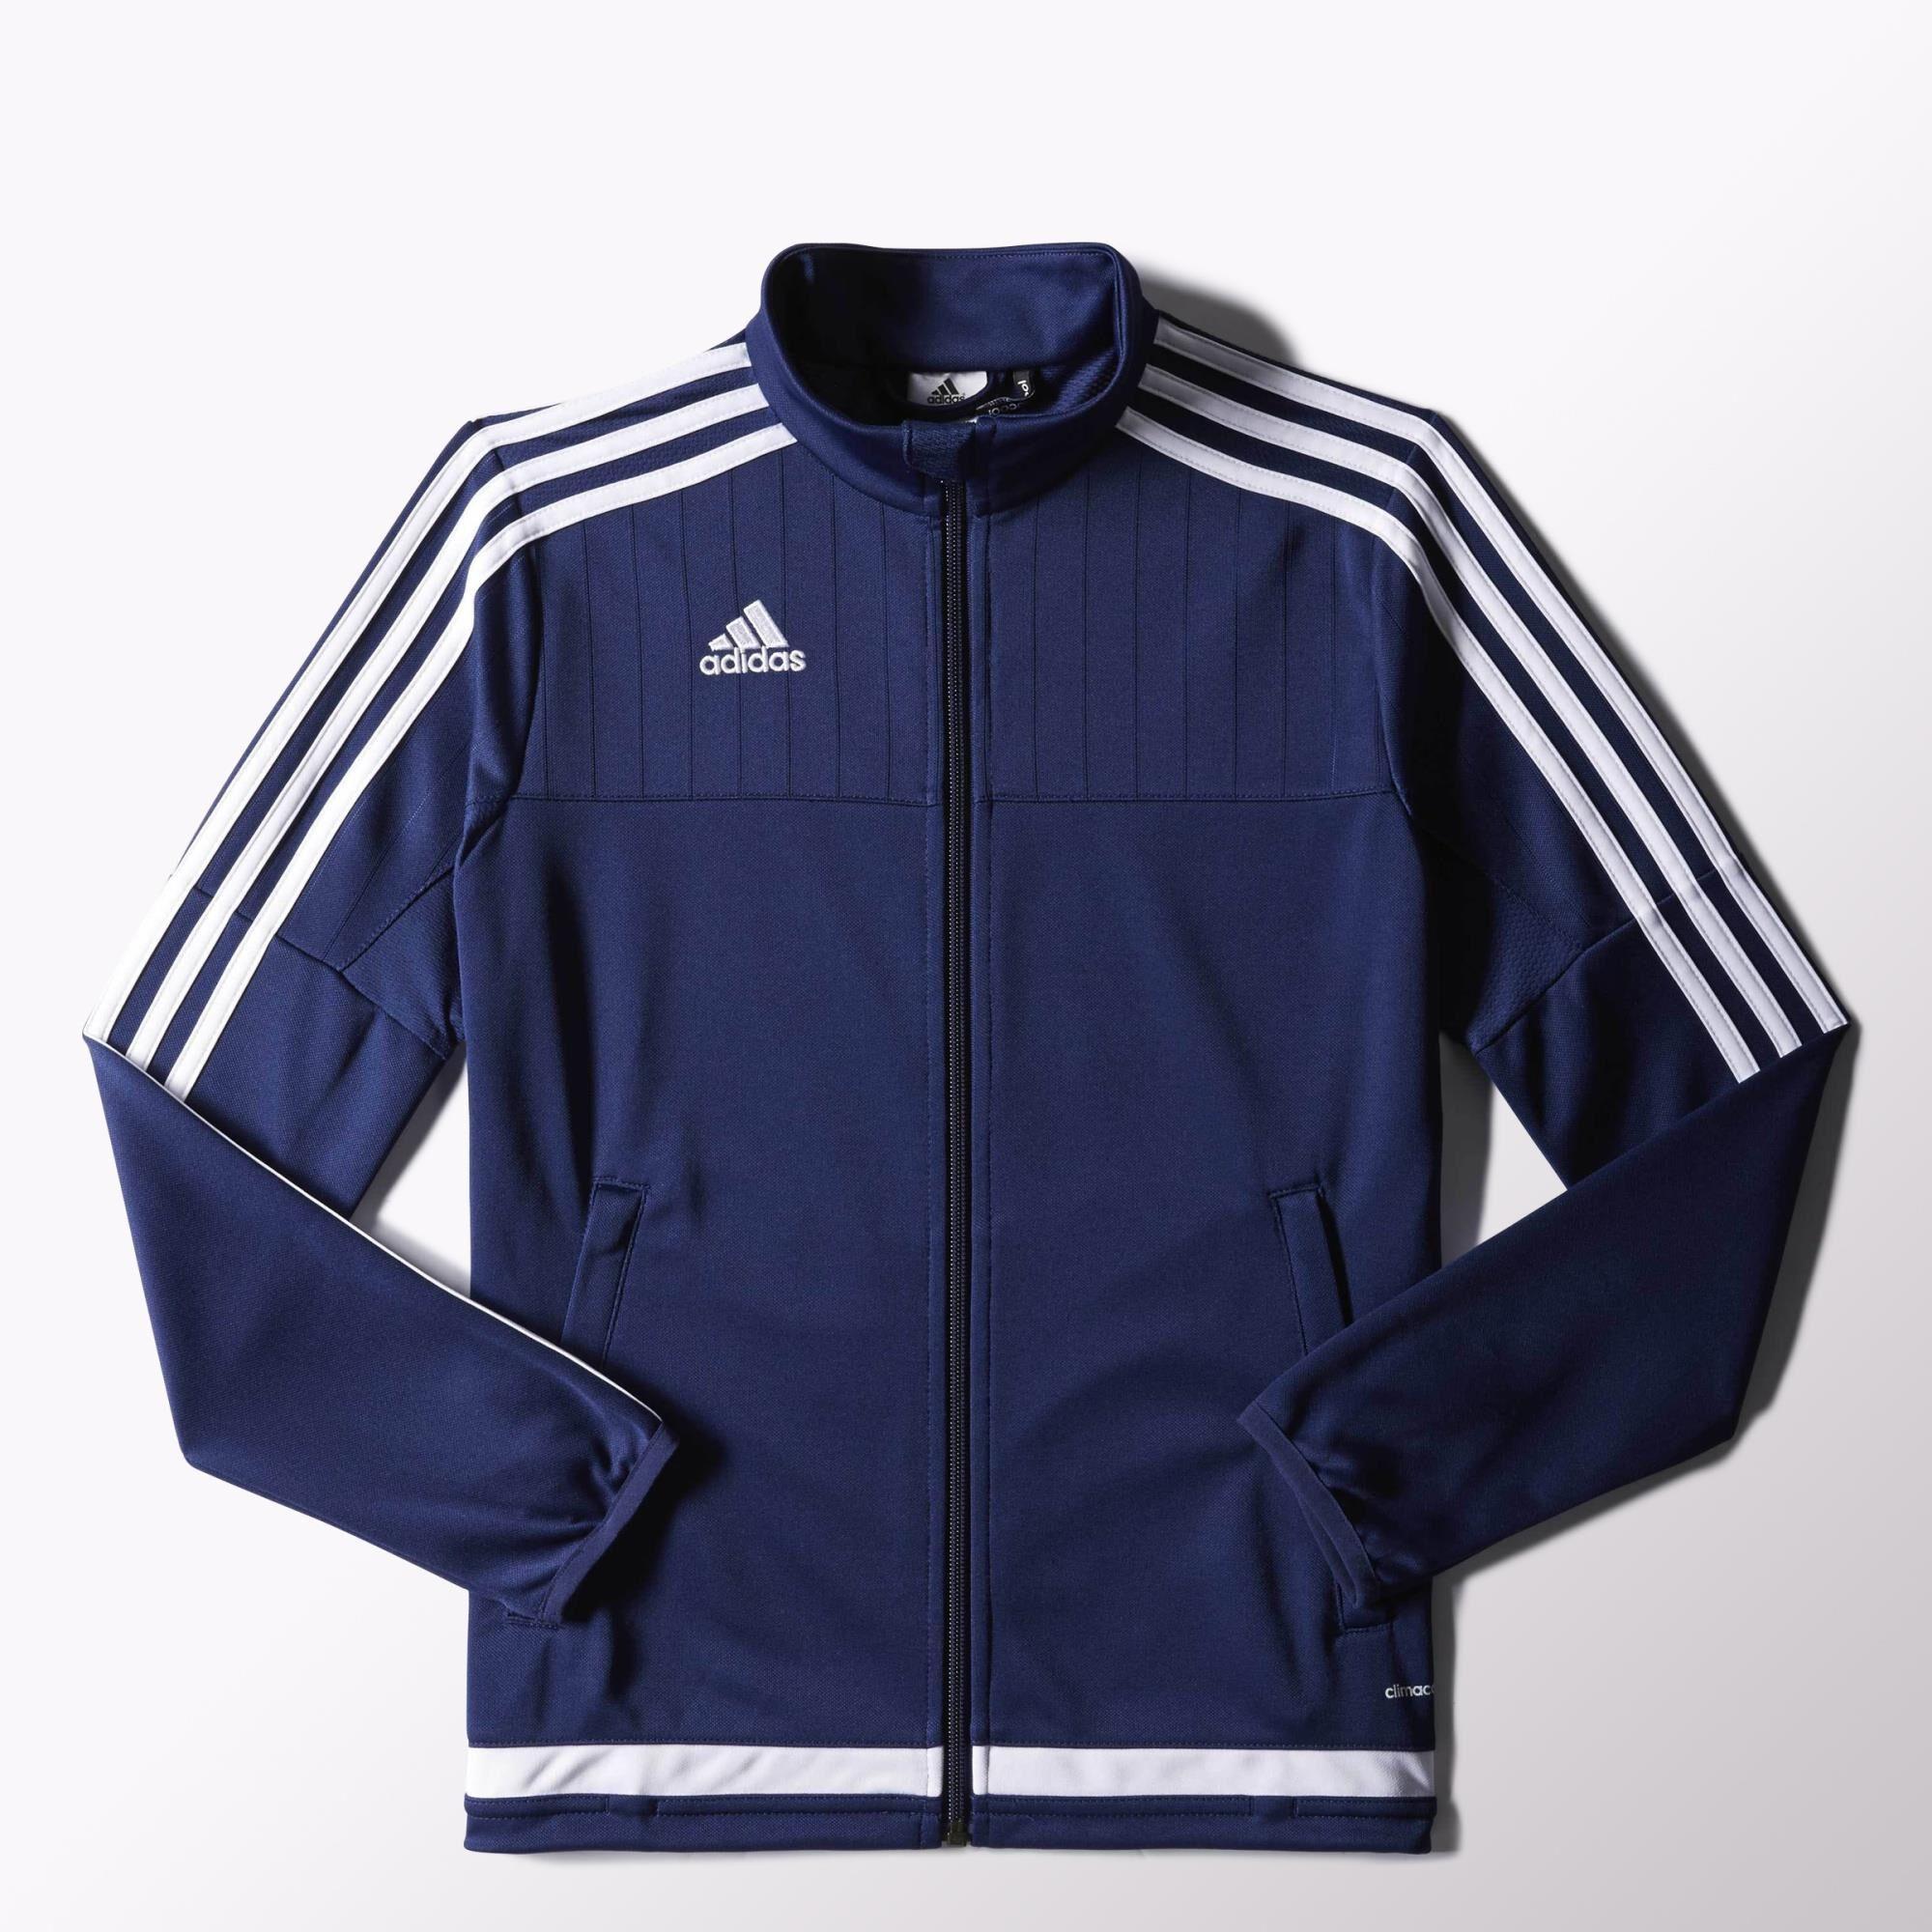 adidas navy blue samba